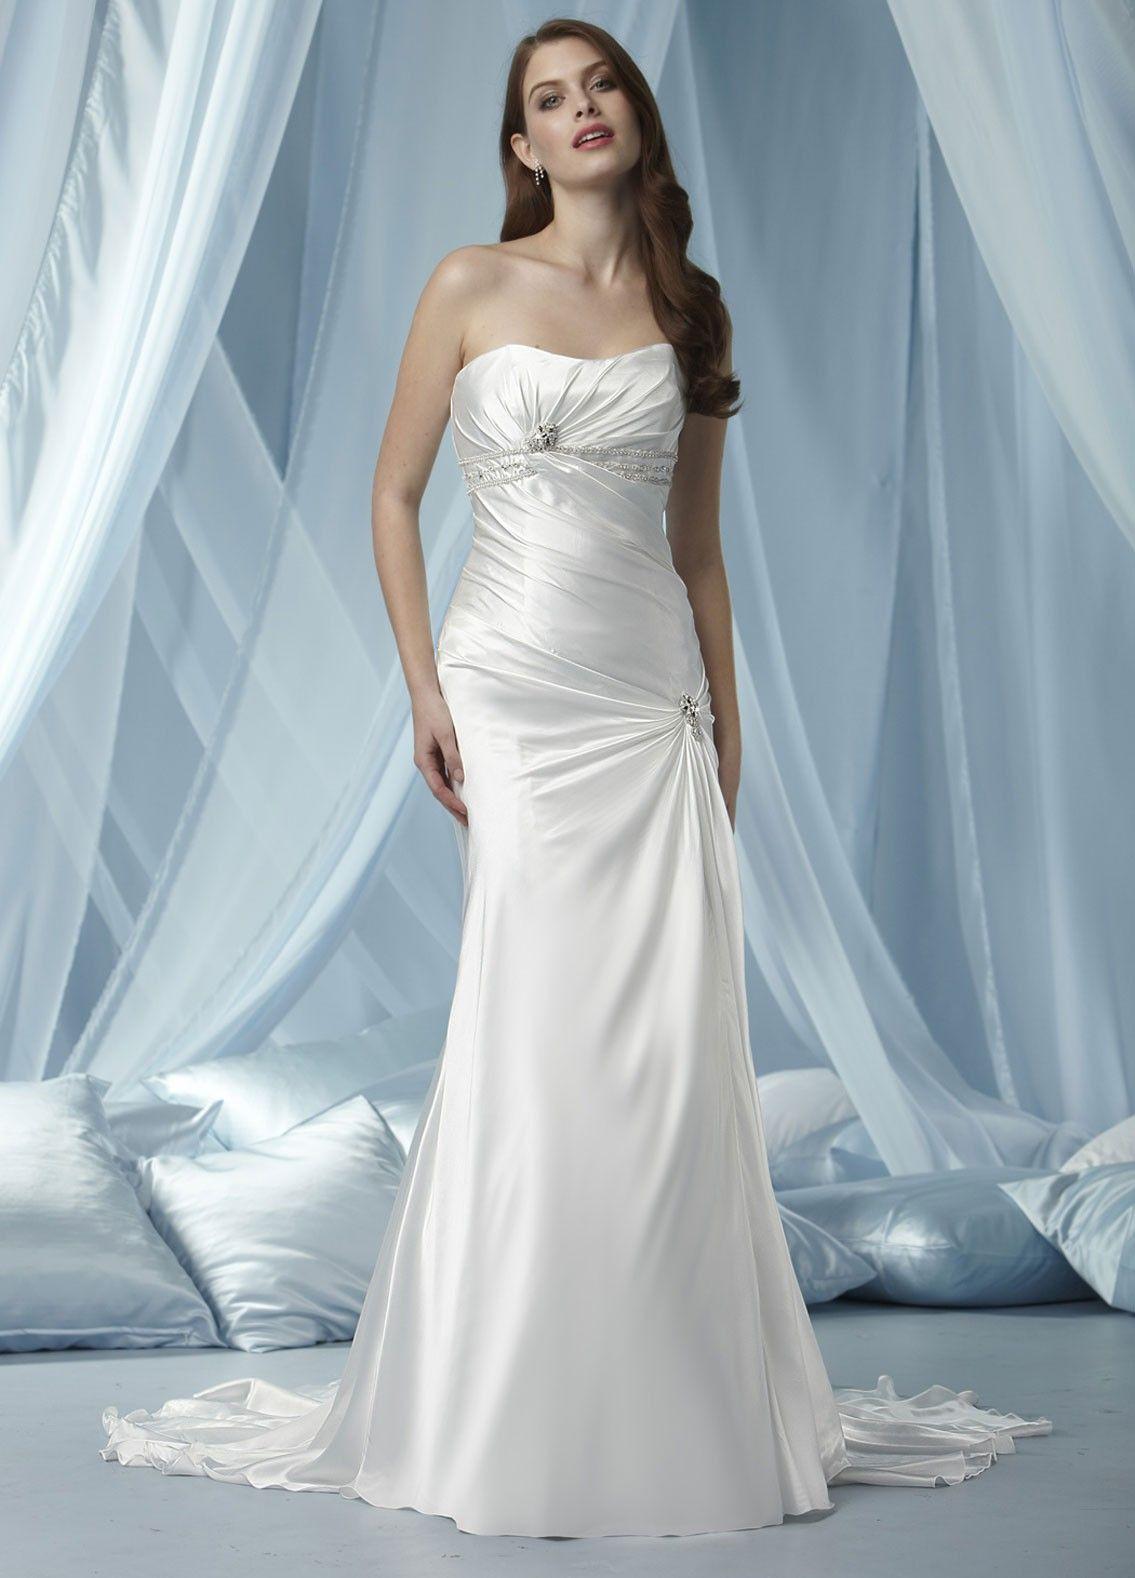 Wedding dresses rental  Charmeuse Strapless Softly Curved Neckline Gathered Bodice Aline